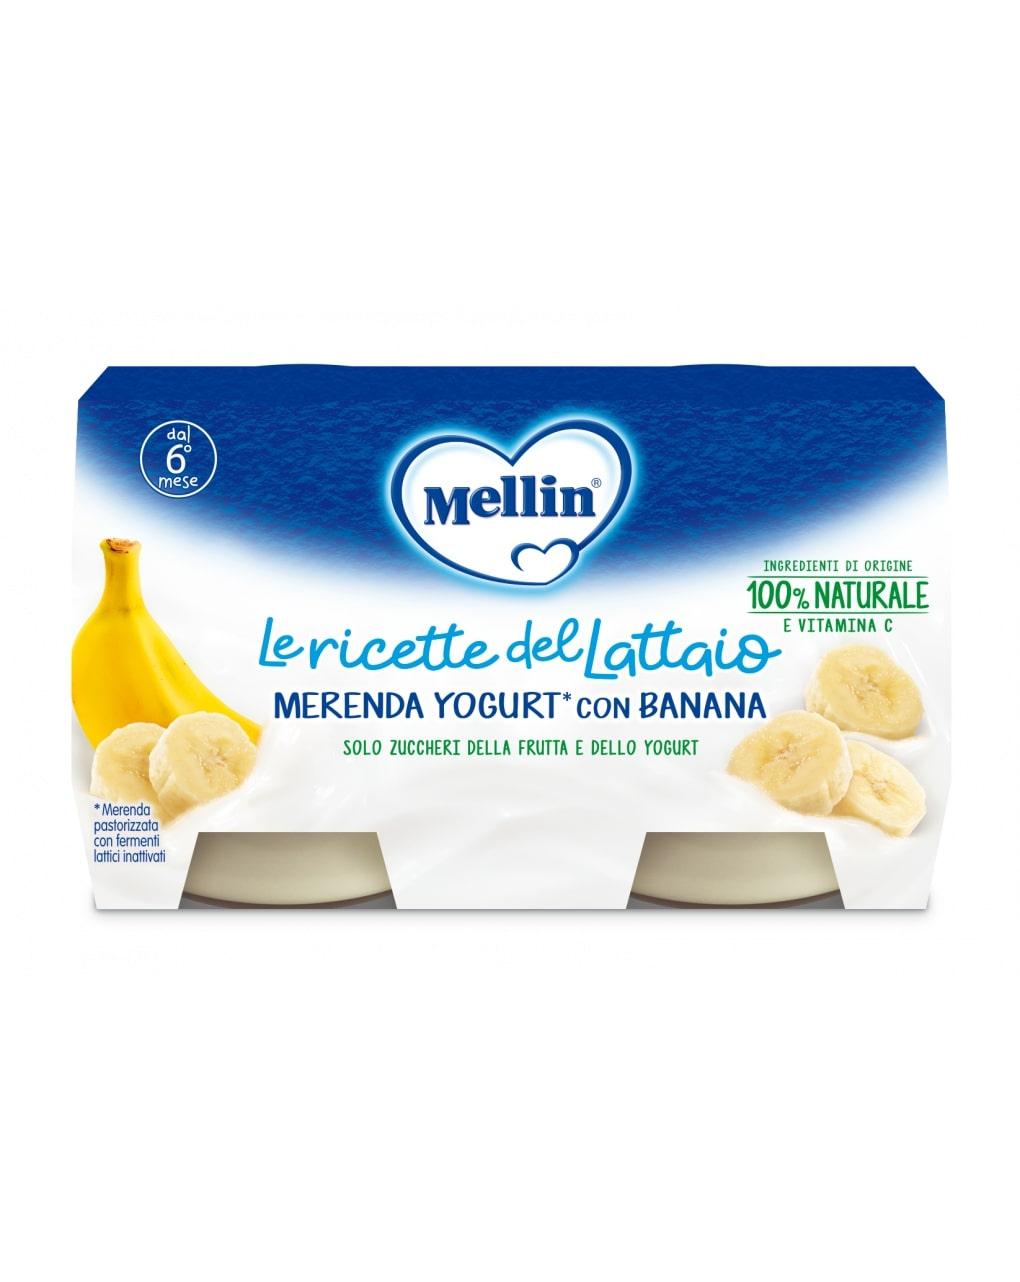 Mellin - merenda yogurt banana 2x120g - Mellin